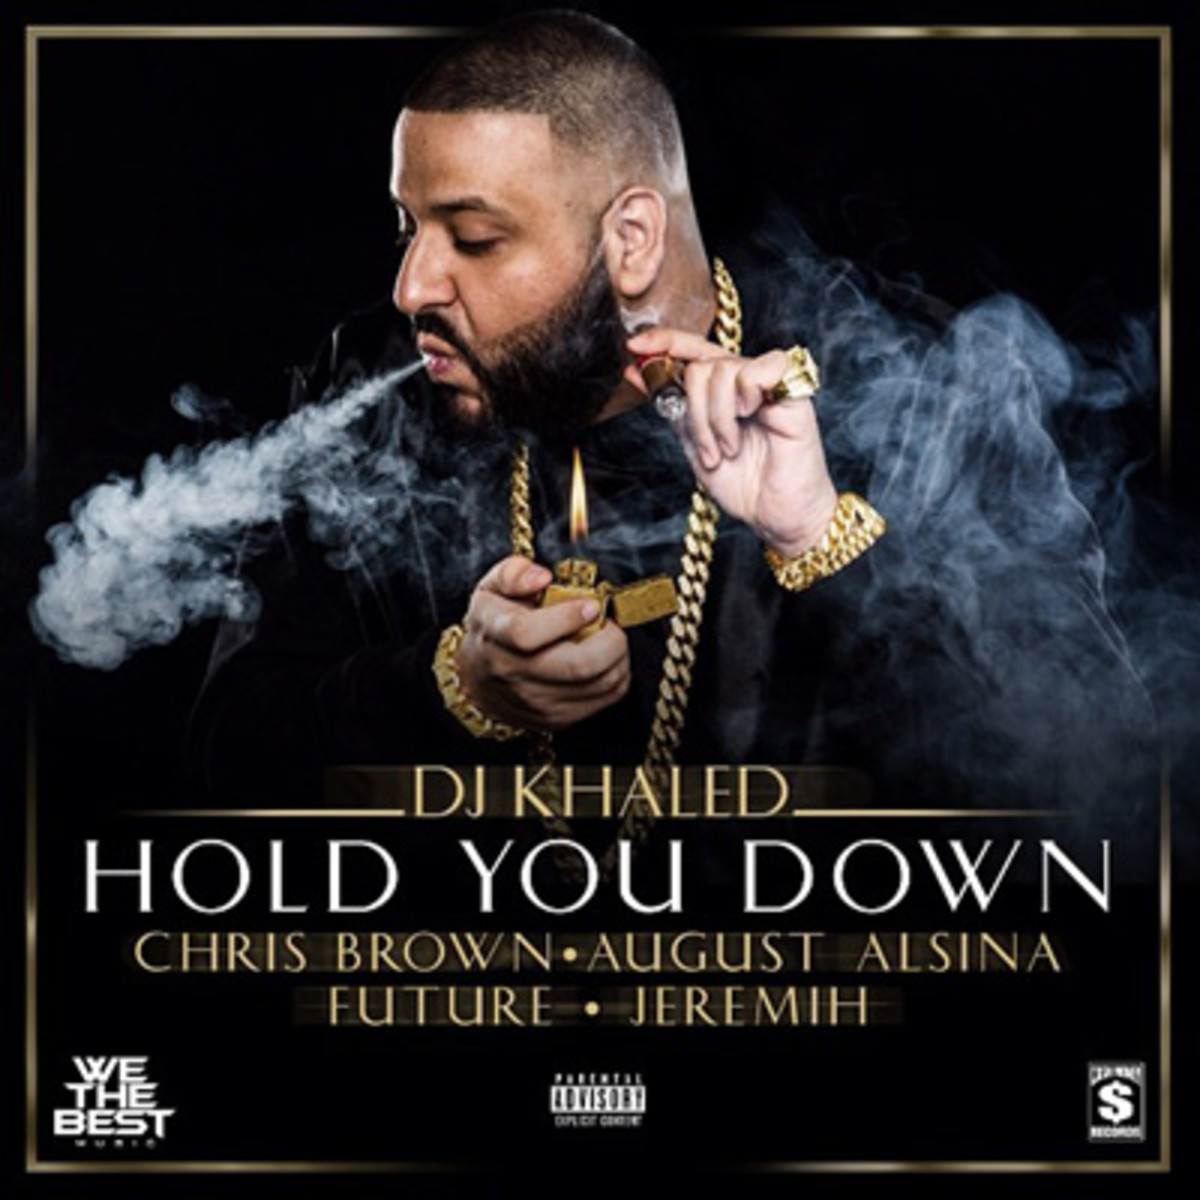 dj-khaled-hold-you-down.jpg